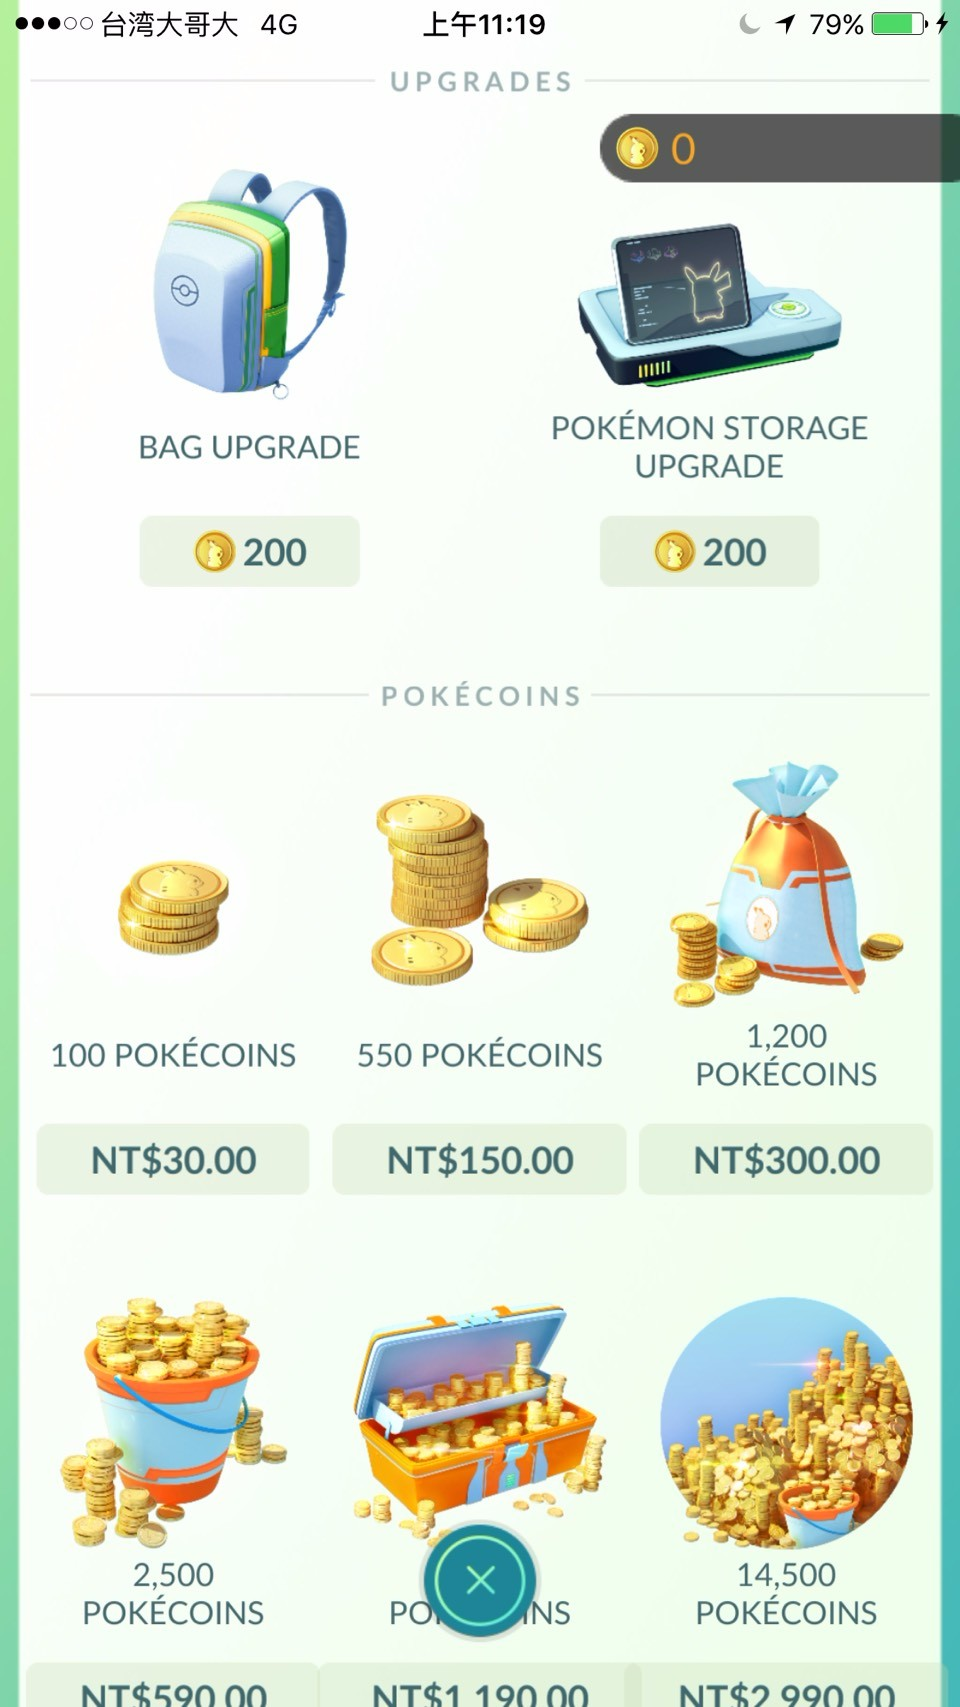 Bag upgrade則是能夠升級背包,裝進更多的寶物。不過要注意的是,這裡大多數都需要花費台幣喔!